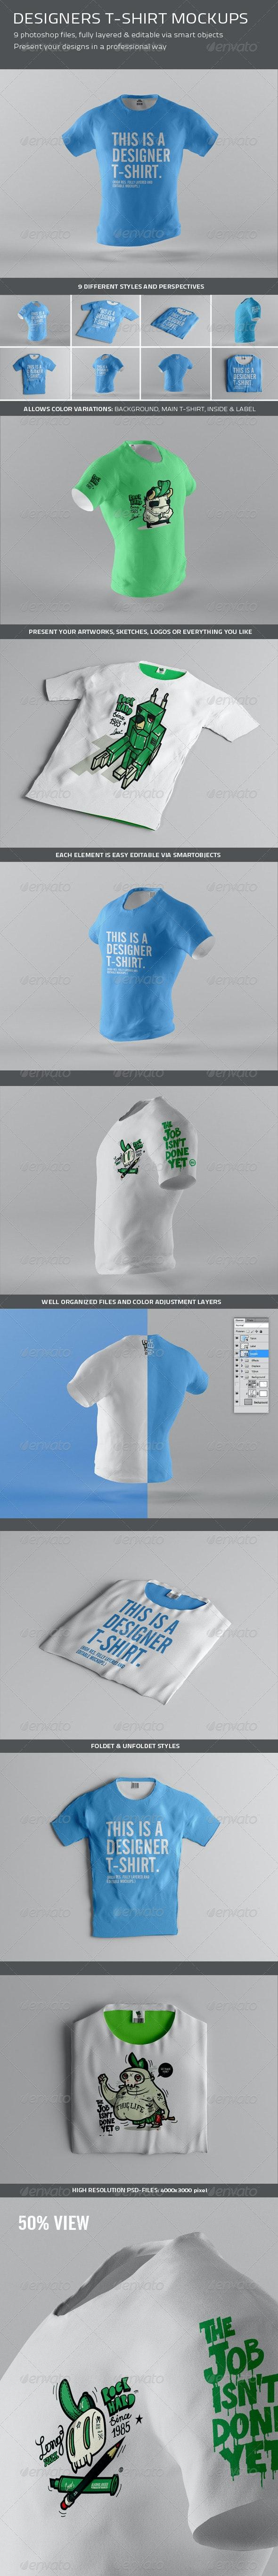 Designers T-Shirt Mockups - T-shirts Apparel